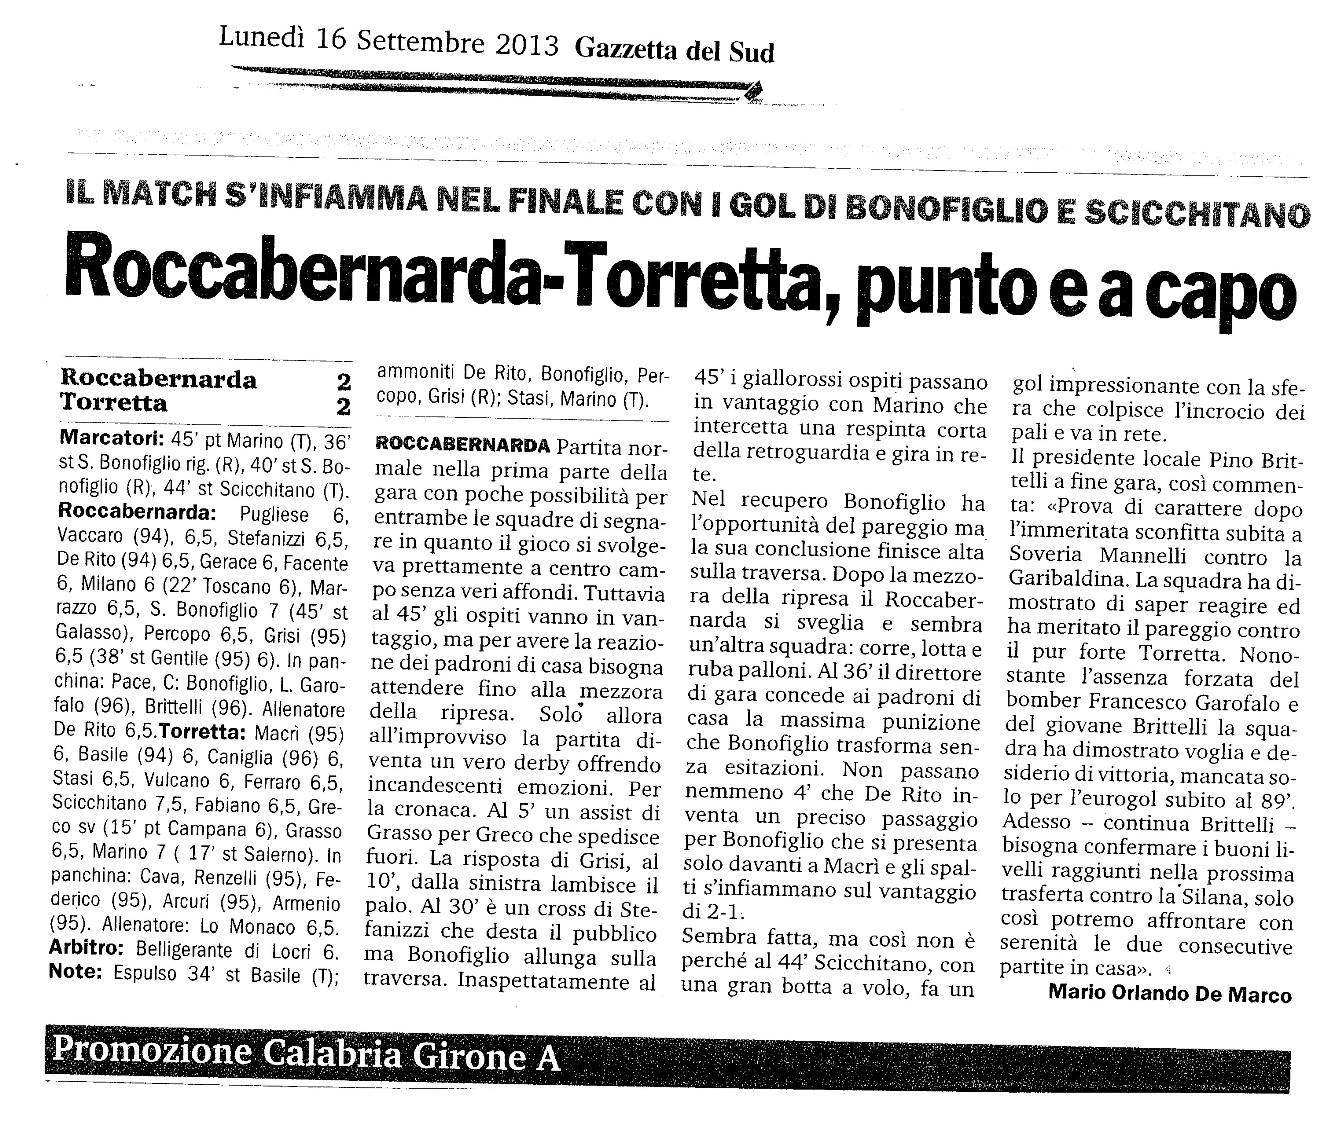 ROCCABERNARDA - TORRETTA (GS LUNEDì 16 SETT 2013)